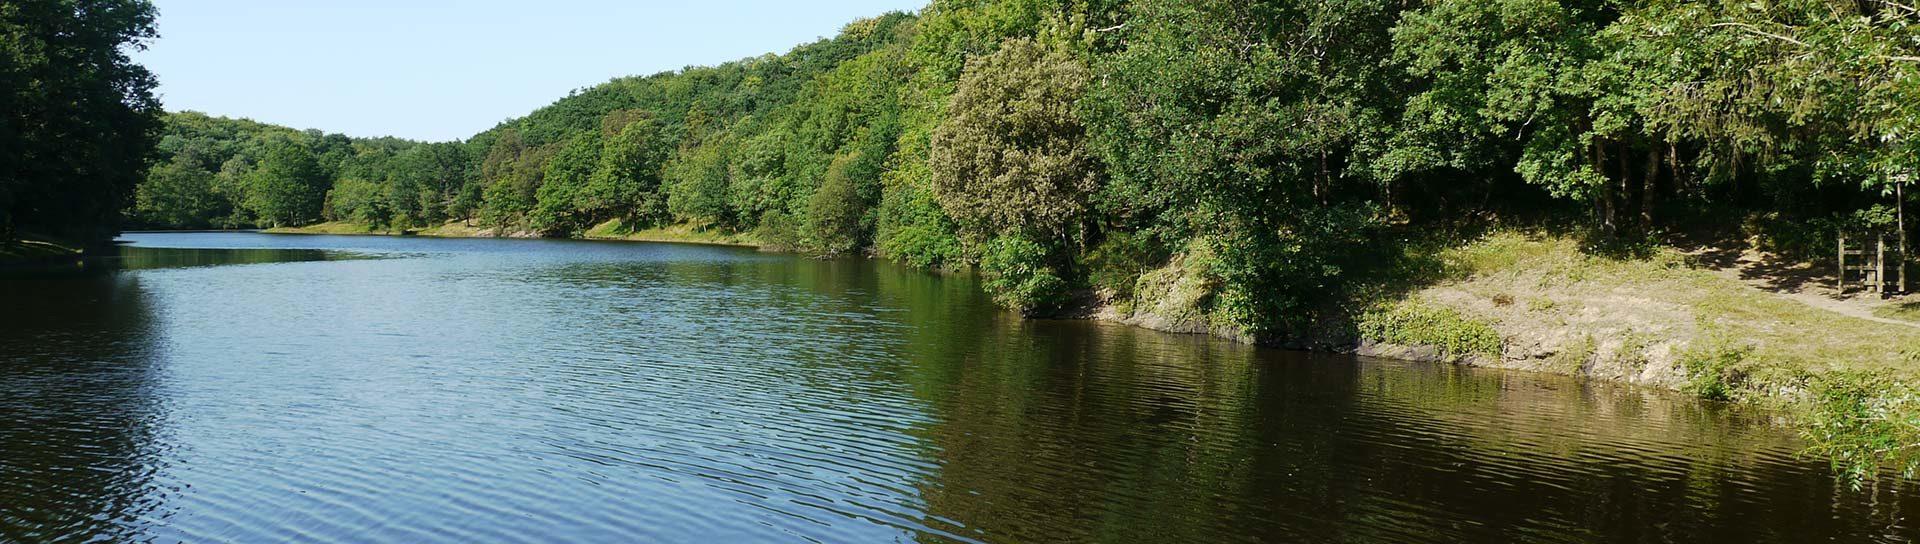 gites Vendée Garnaud lac de Finfarine